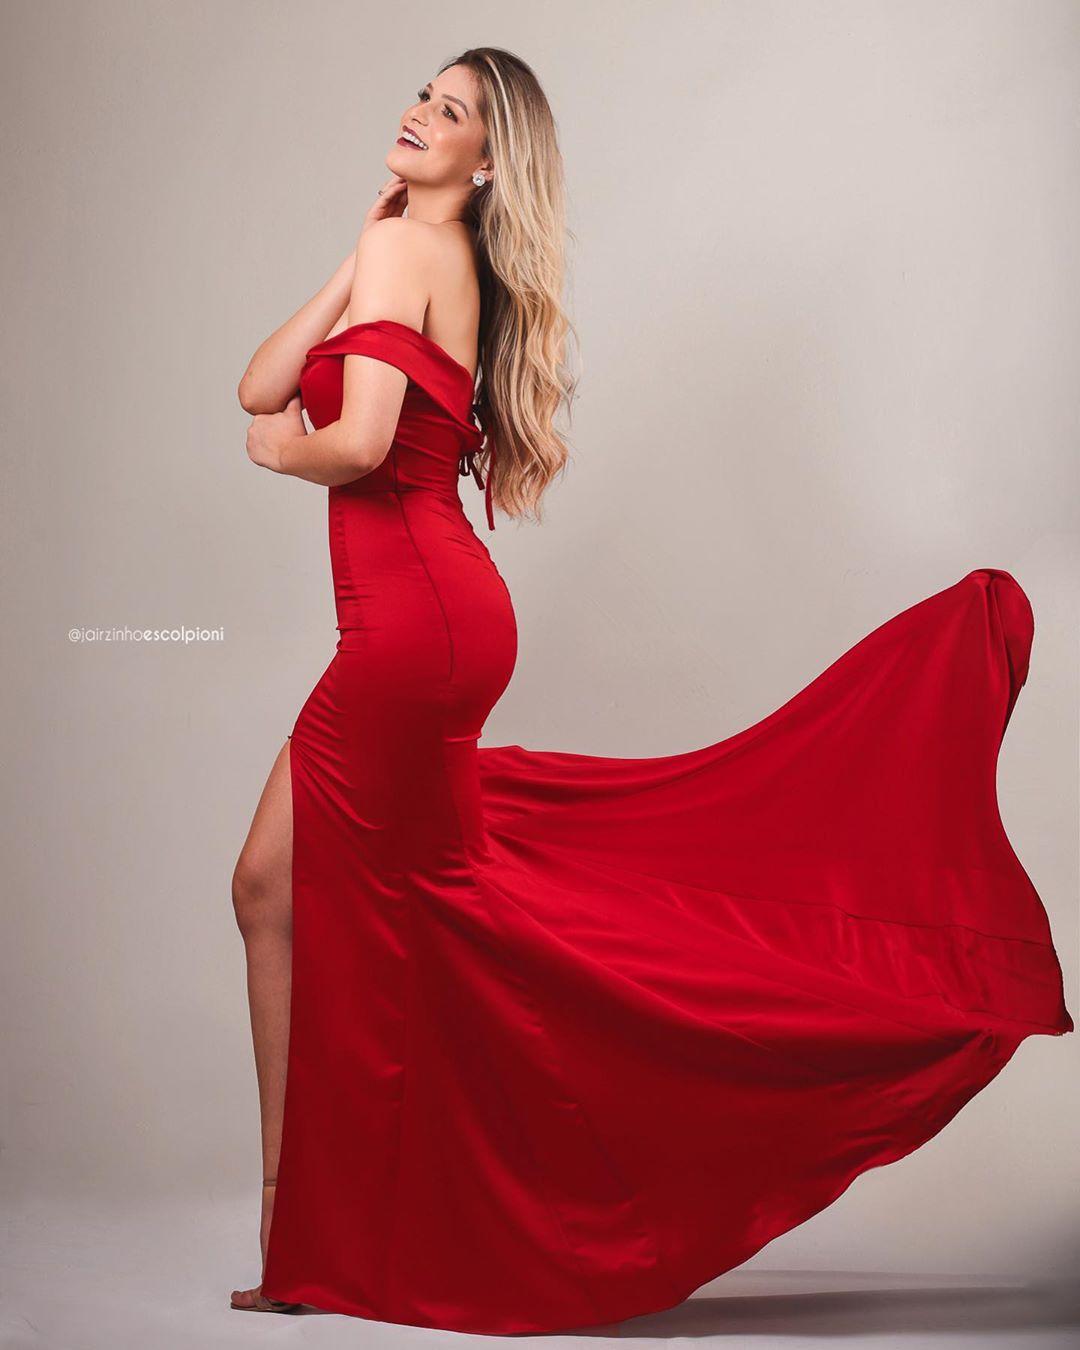 maria gabriela batistela, miss brasil terra 2019. 67578410